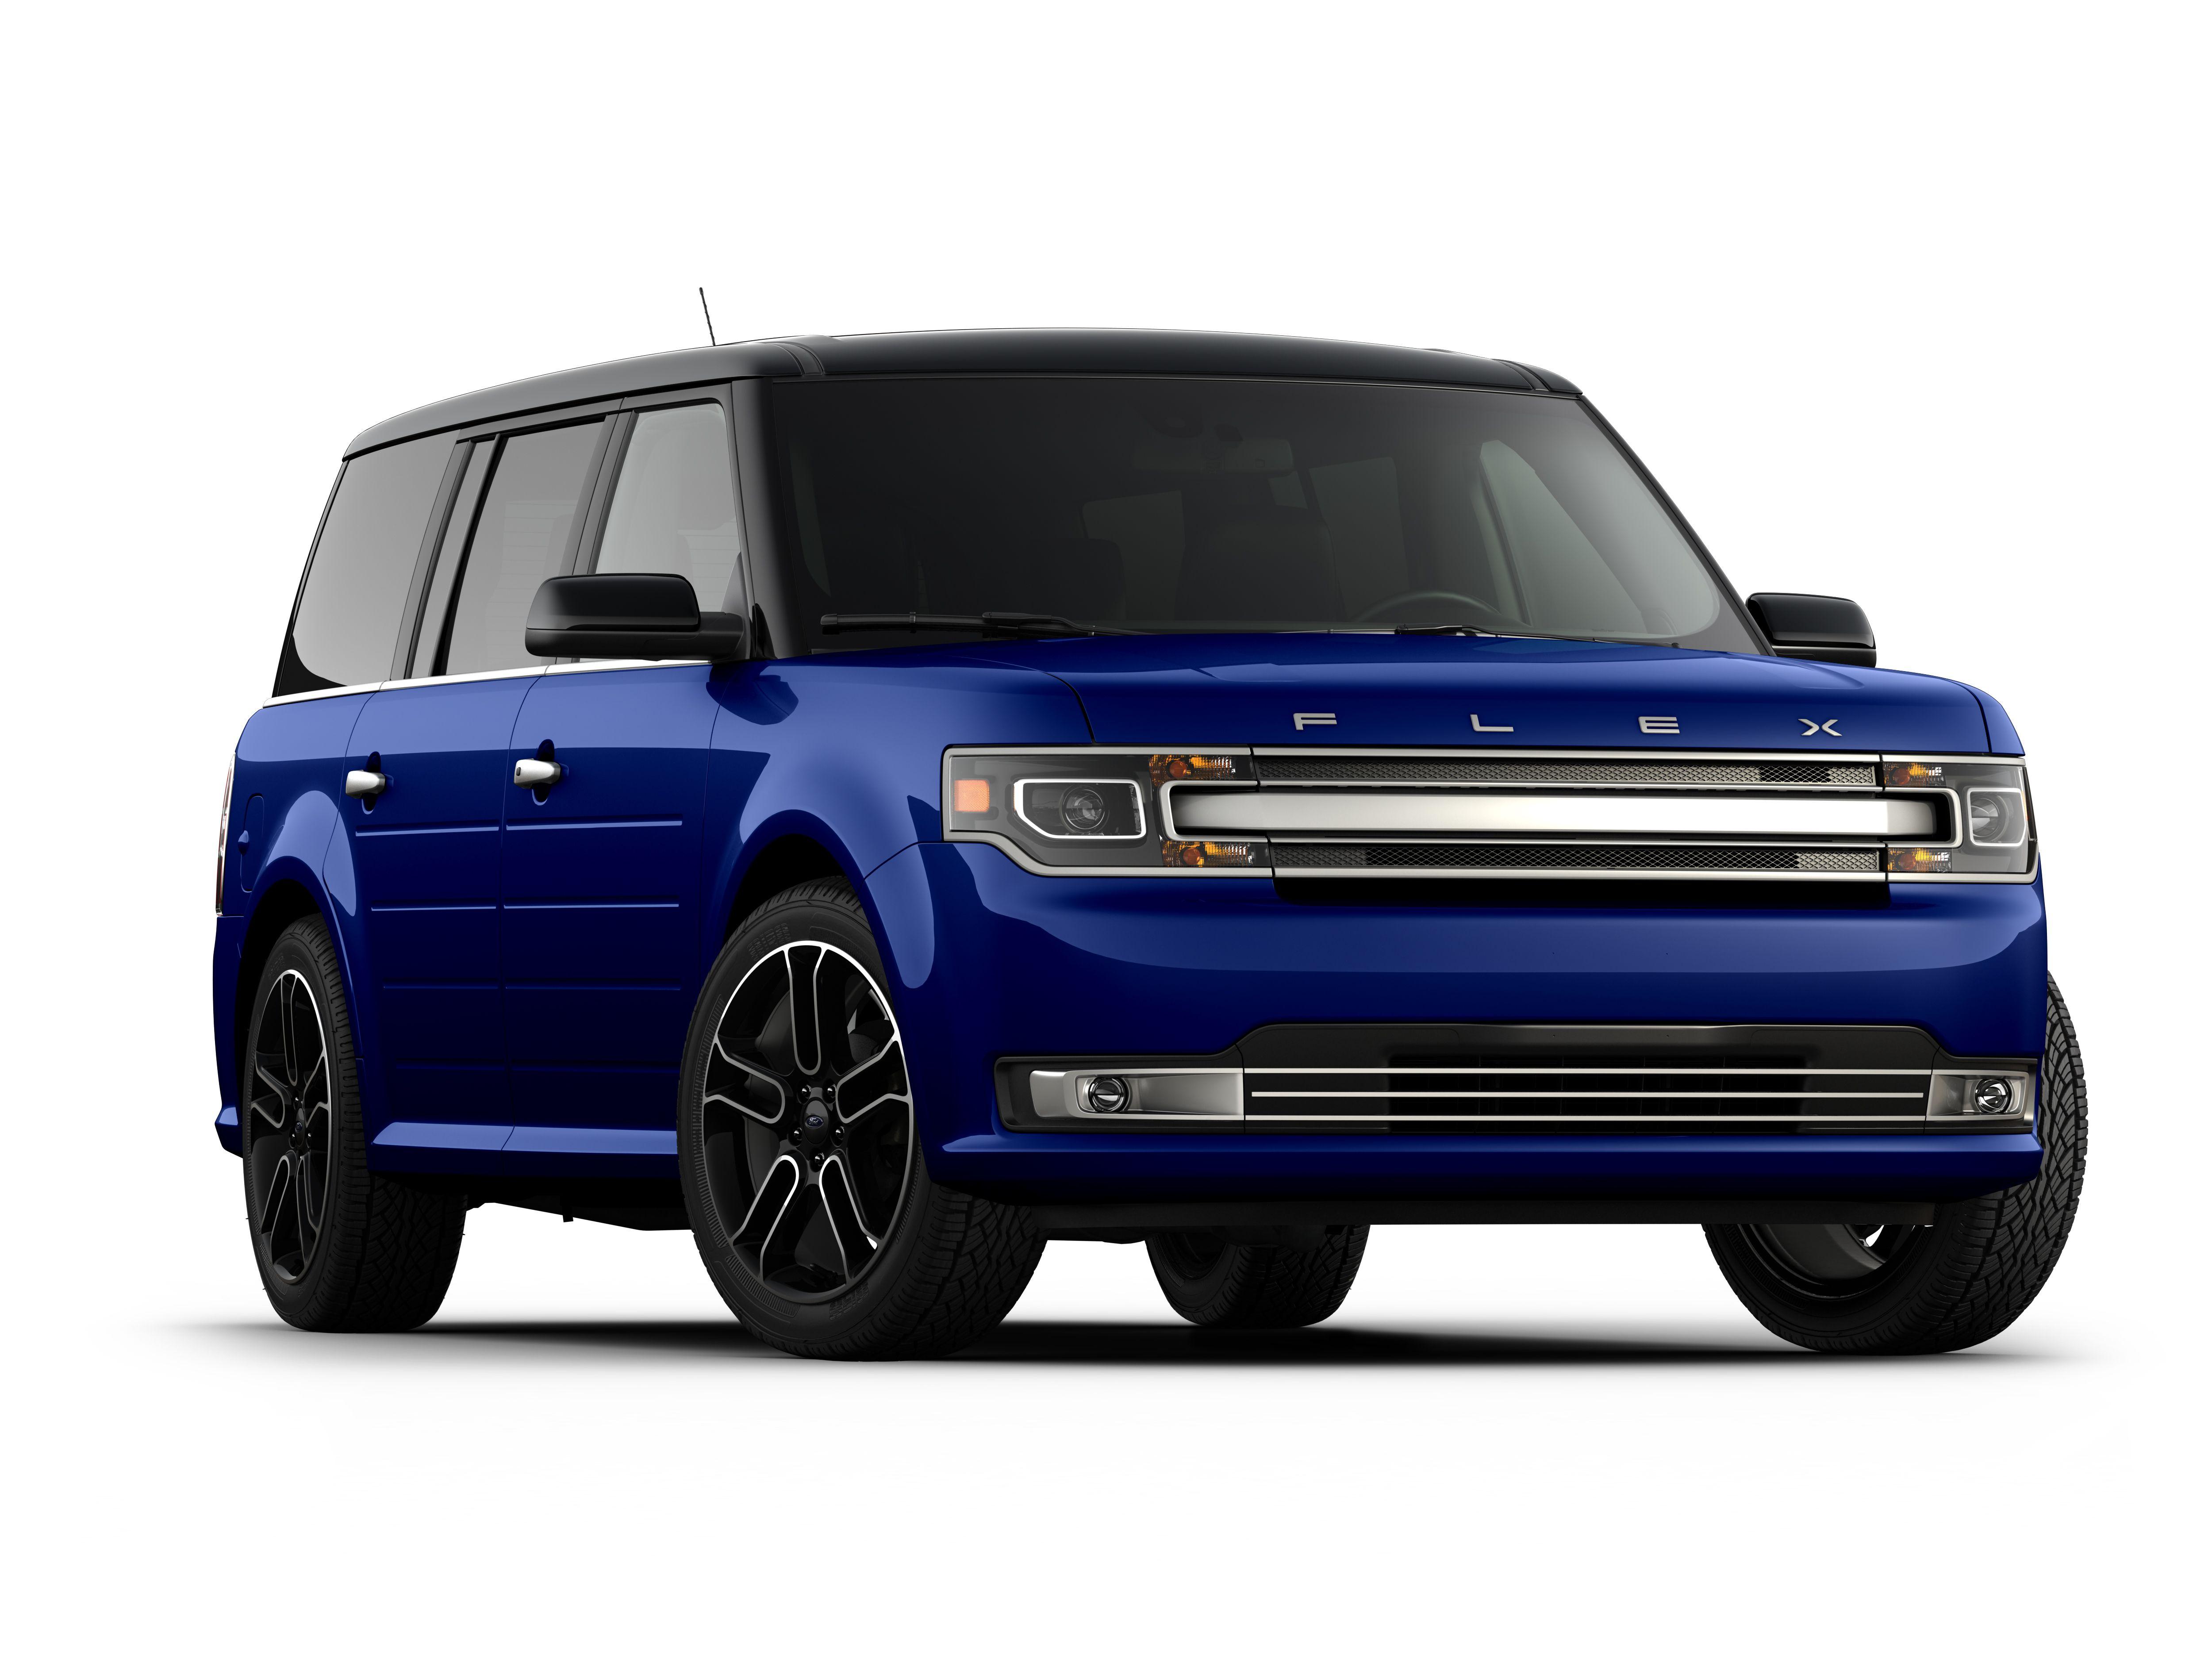 2013 Ford Flex Titanium Shopkick Treatyourself For My Mom